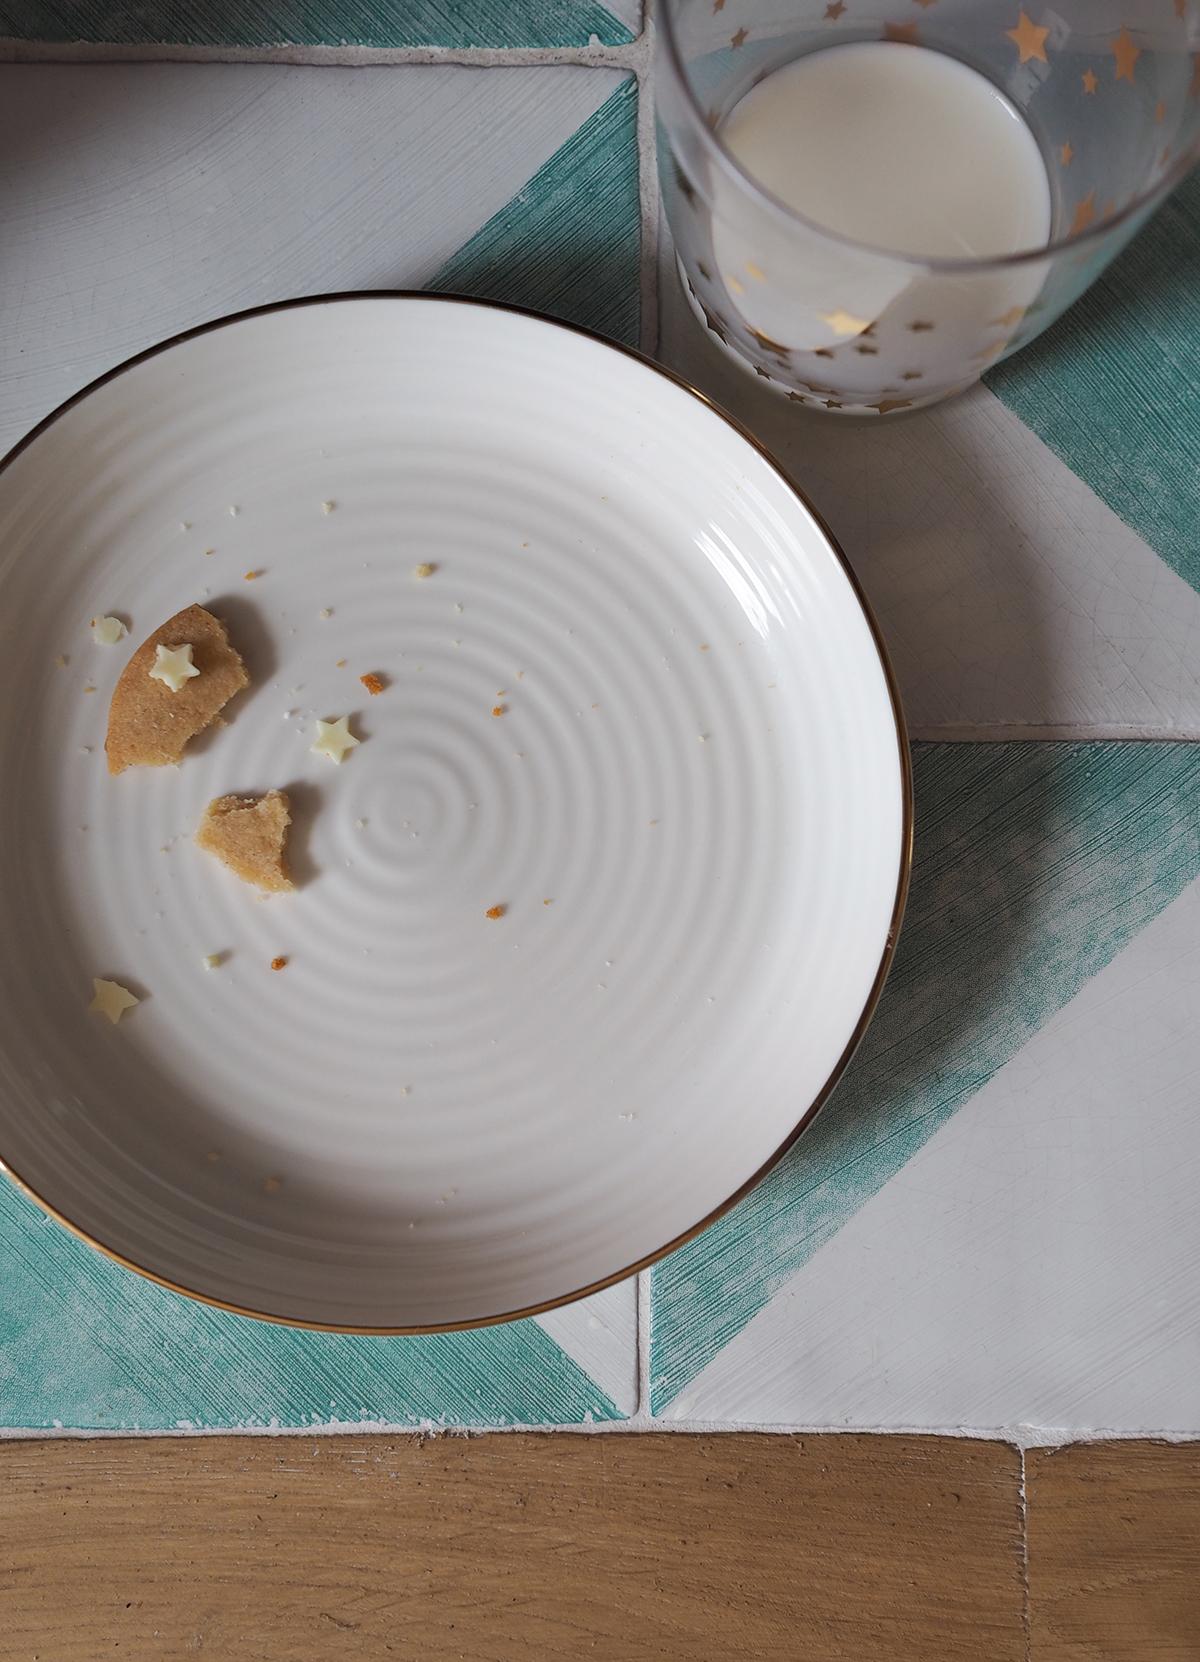 empty Santa snack plate